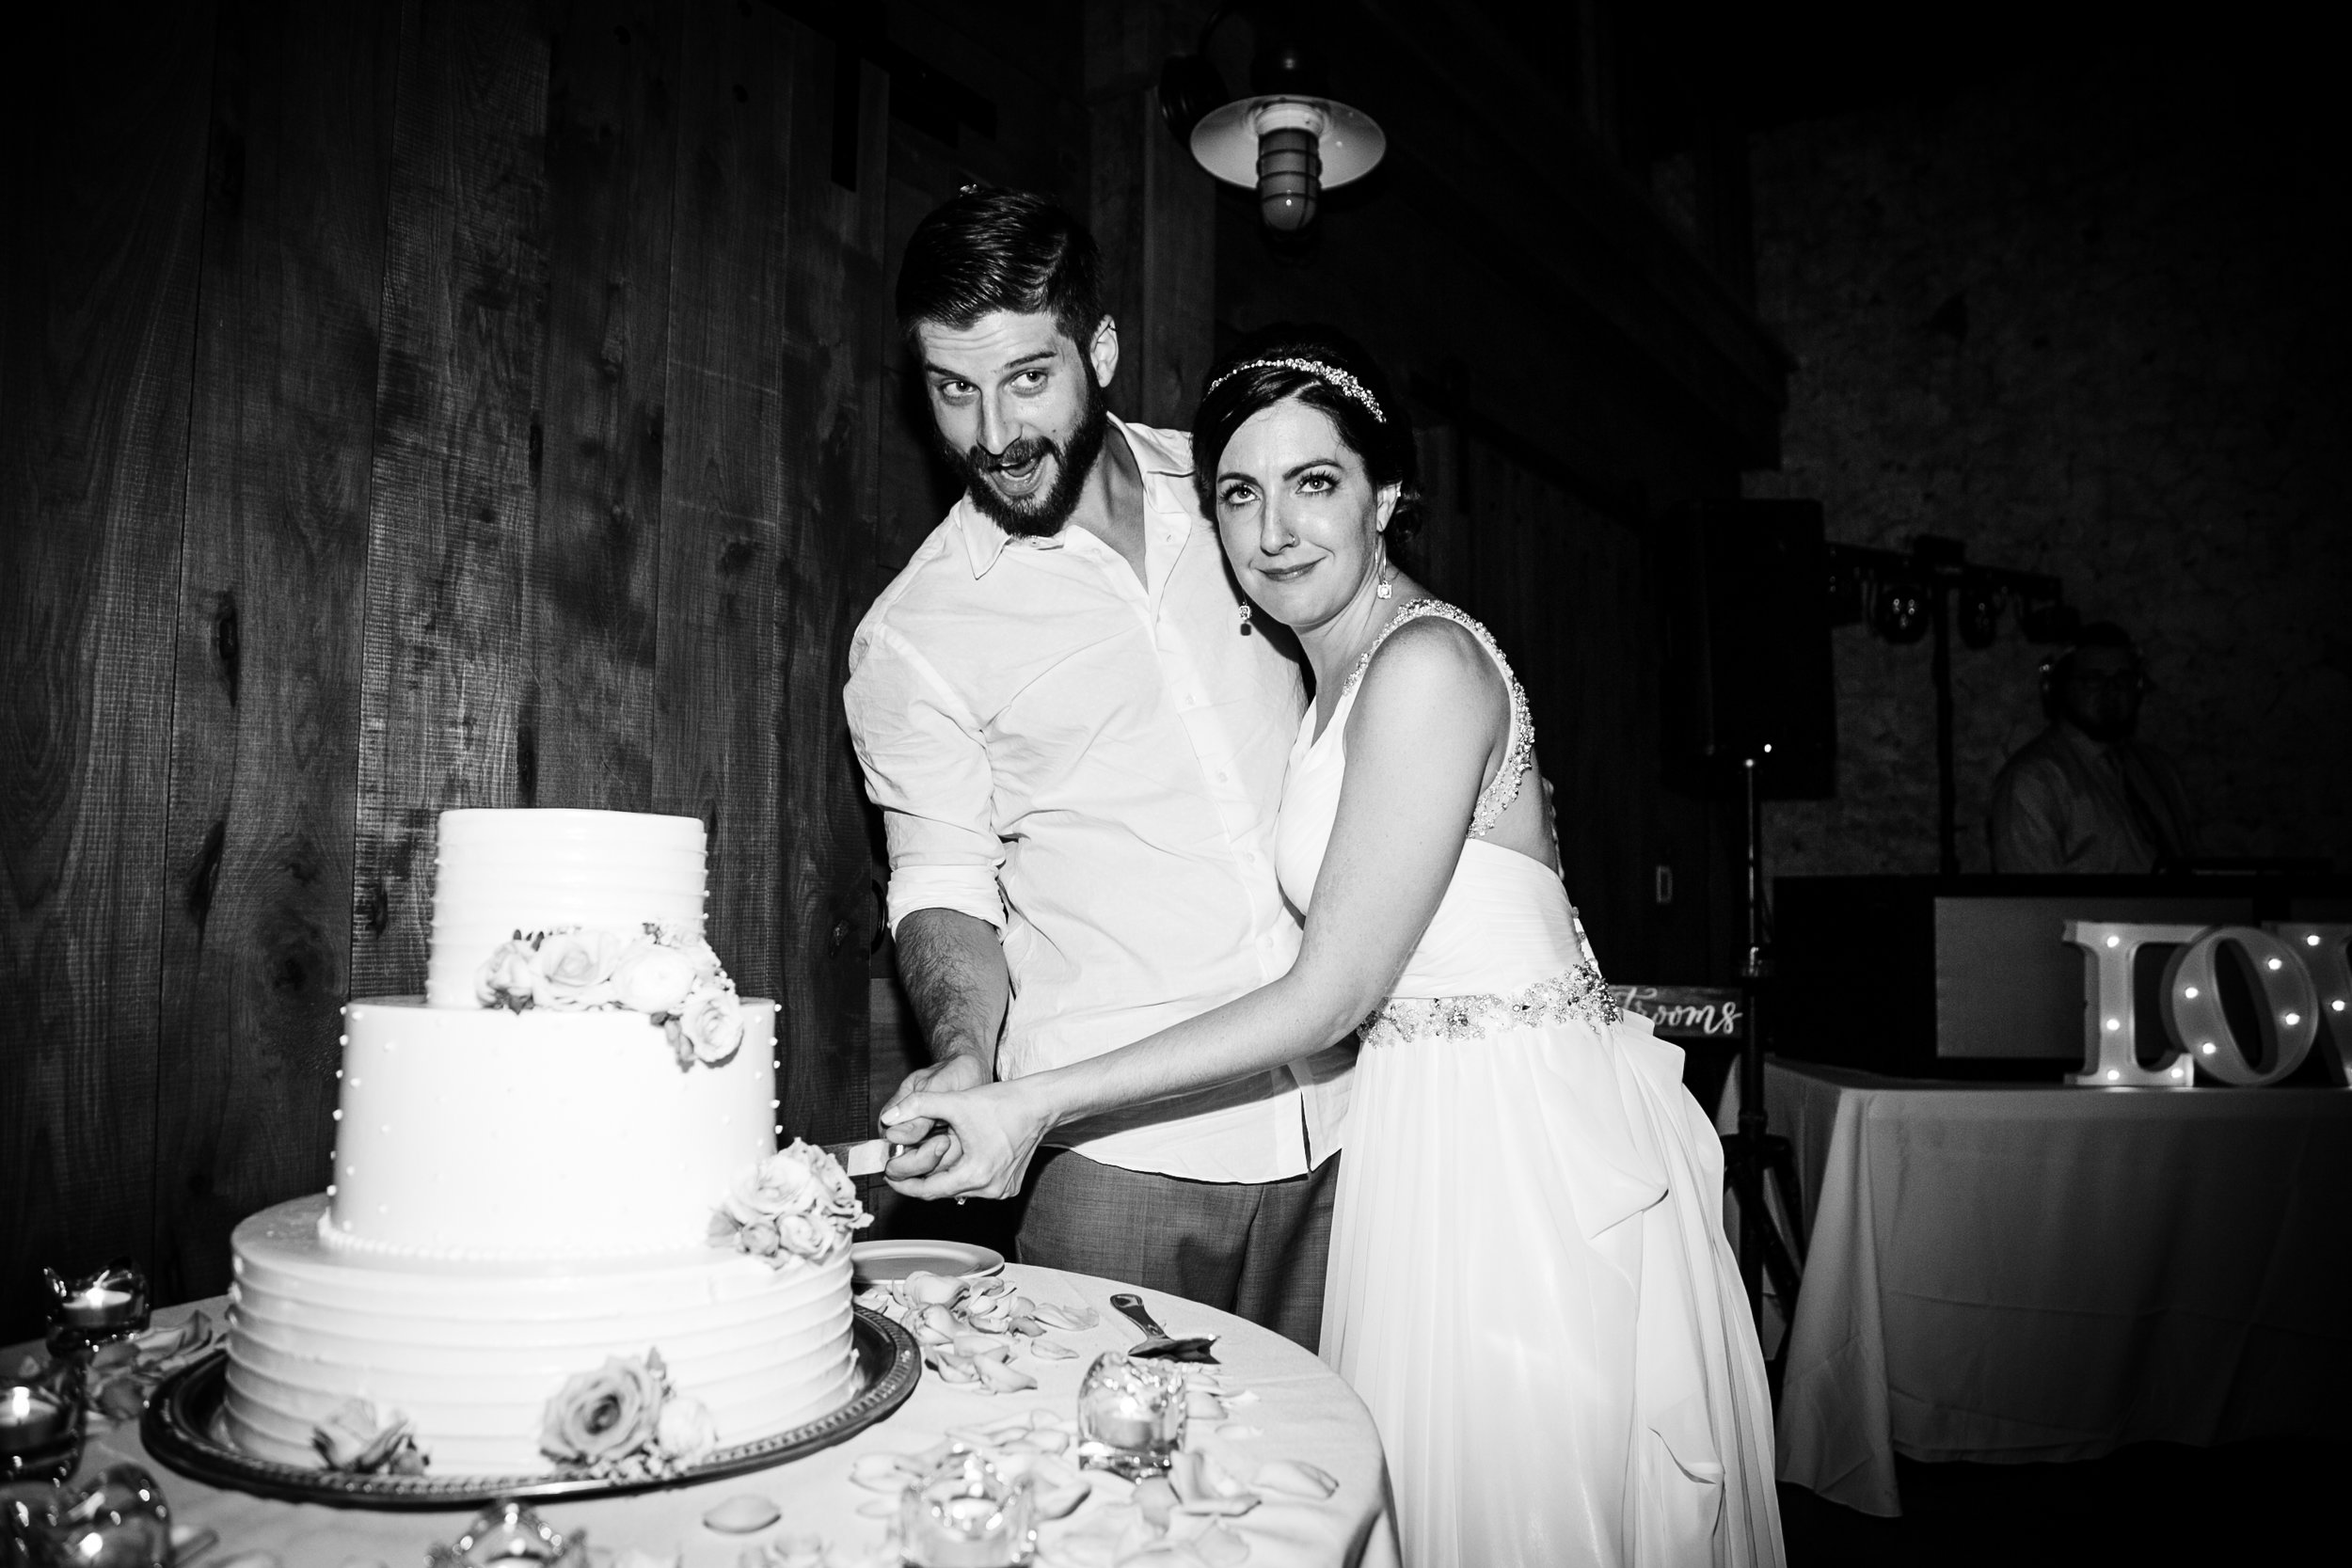 TYLER ARBORETUM WEDDING PHOTOGRAPHY LOVESTRUCK PICTURES-099.jpg